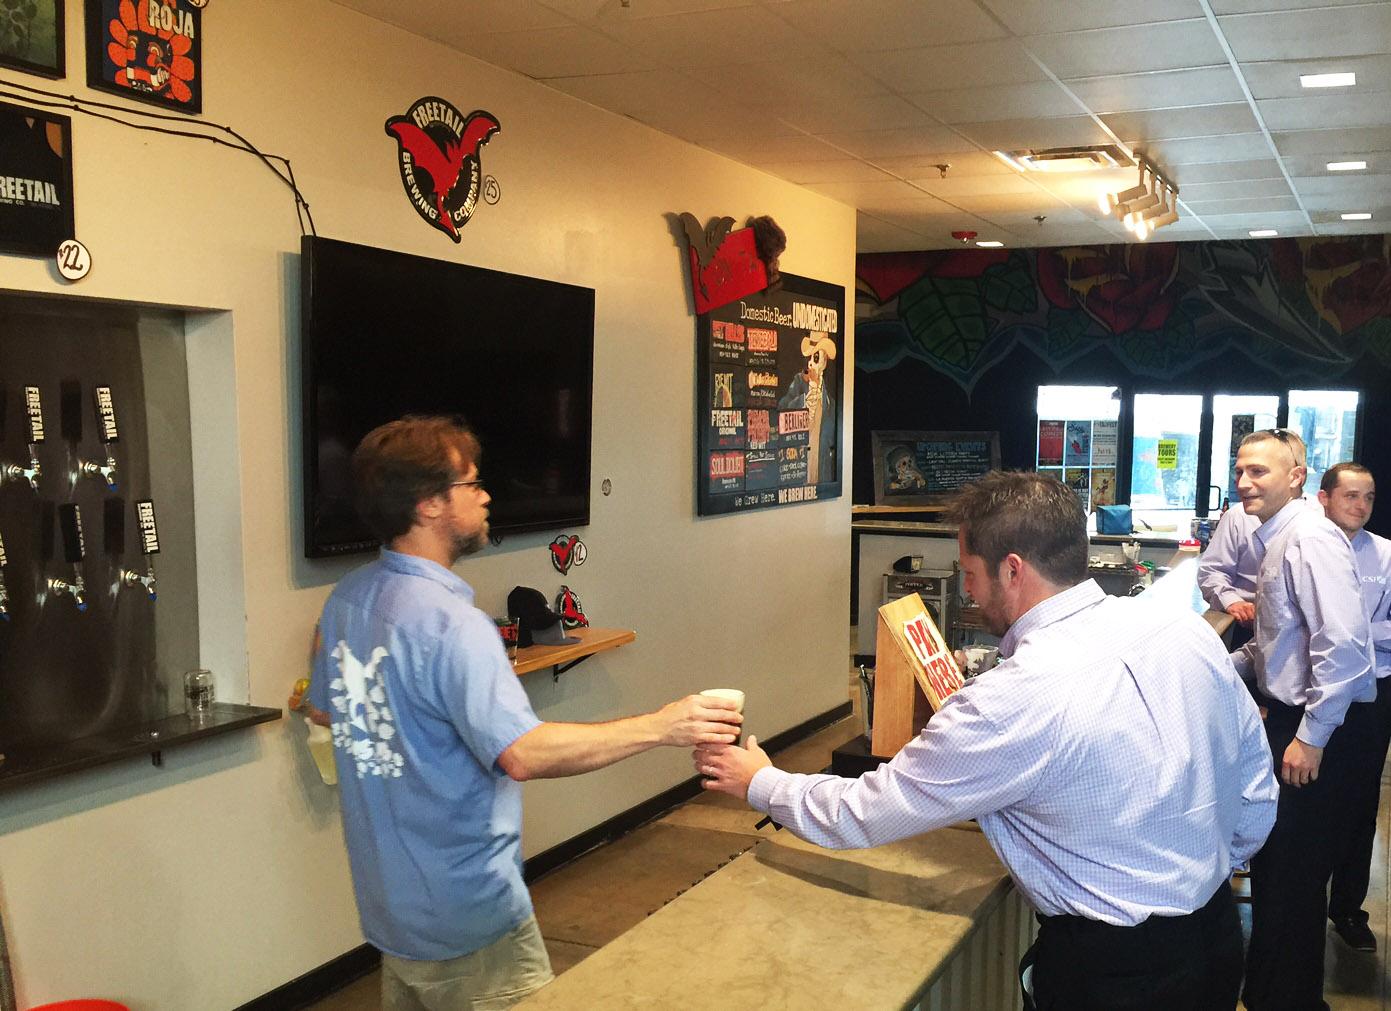 299. FreeTail Brewing Company, San Antonio Tx, 2016